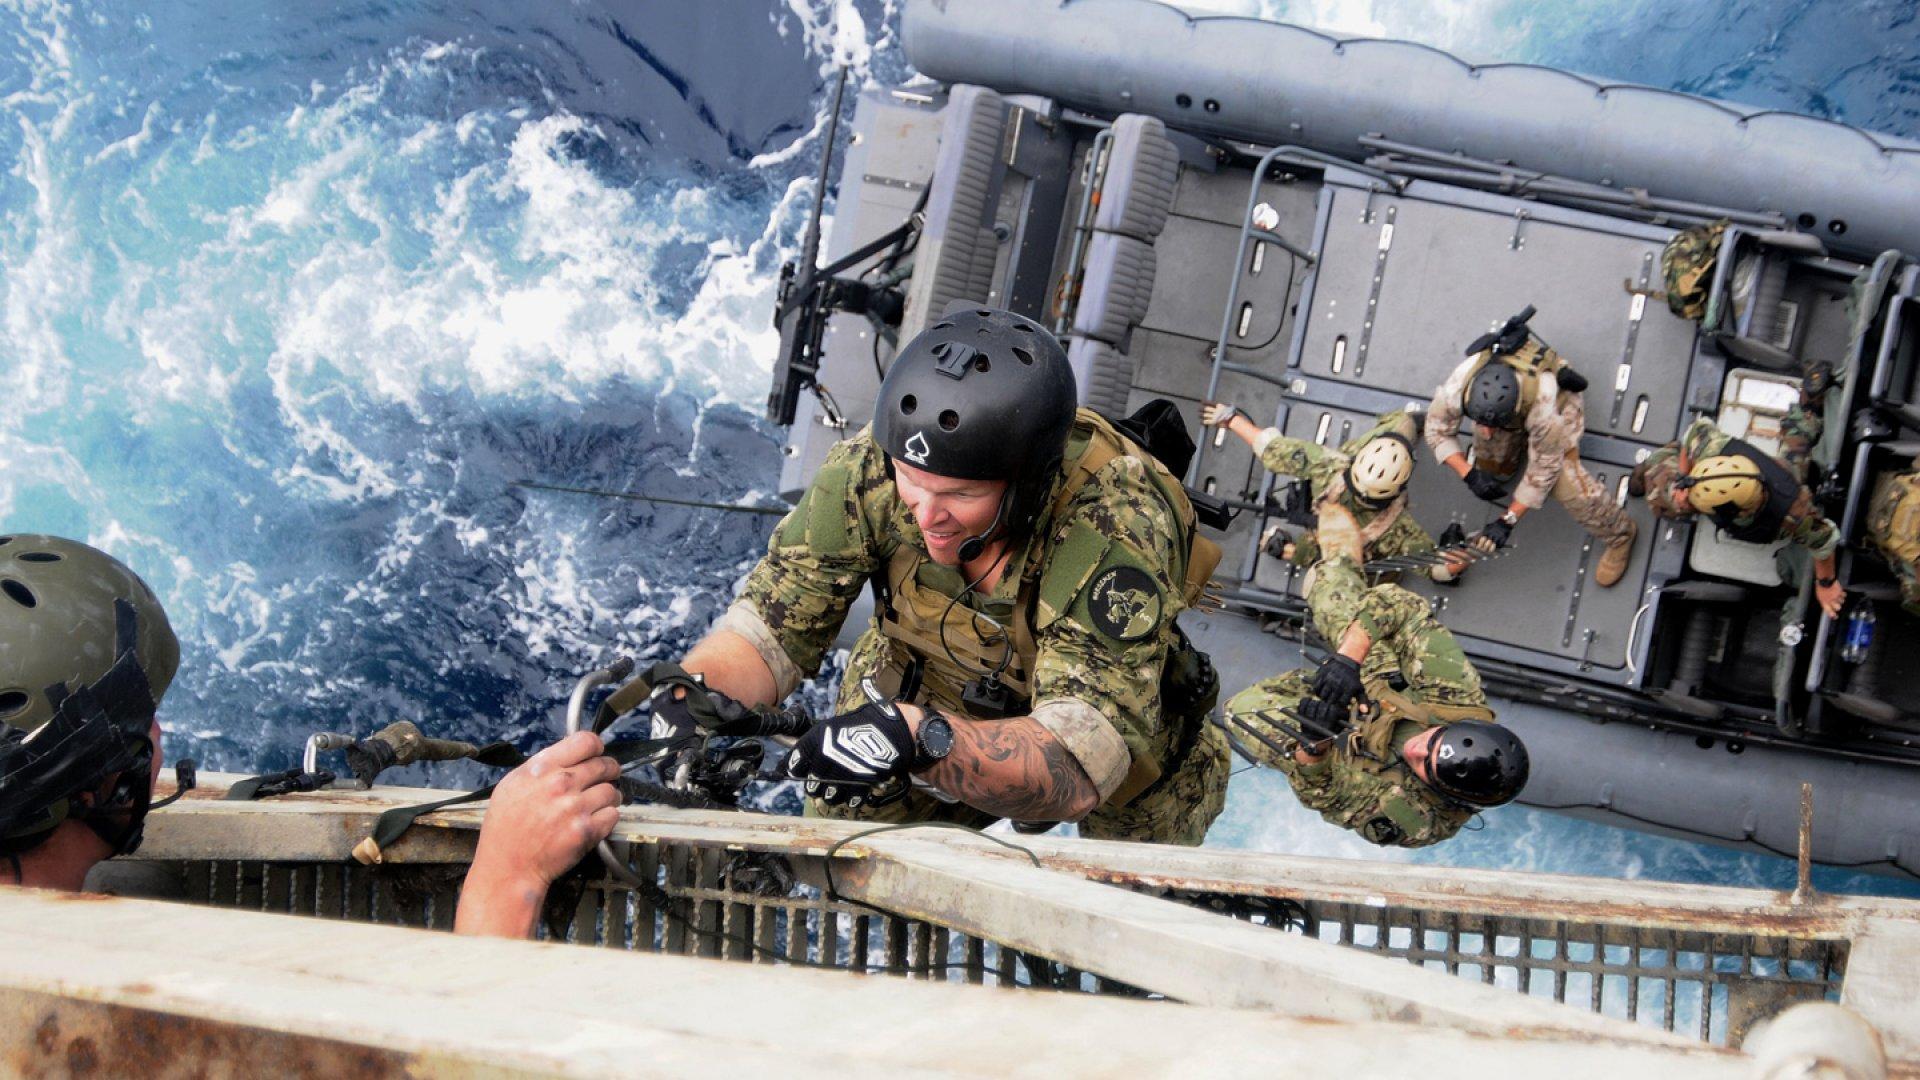 Navy SEALs training in Long Beach, California. July, 2011.